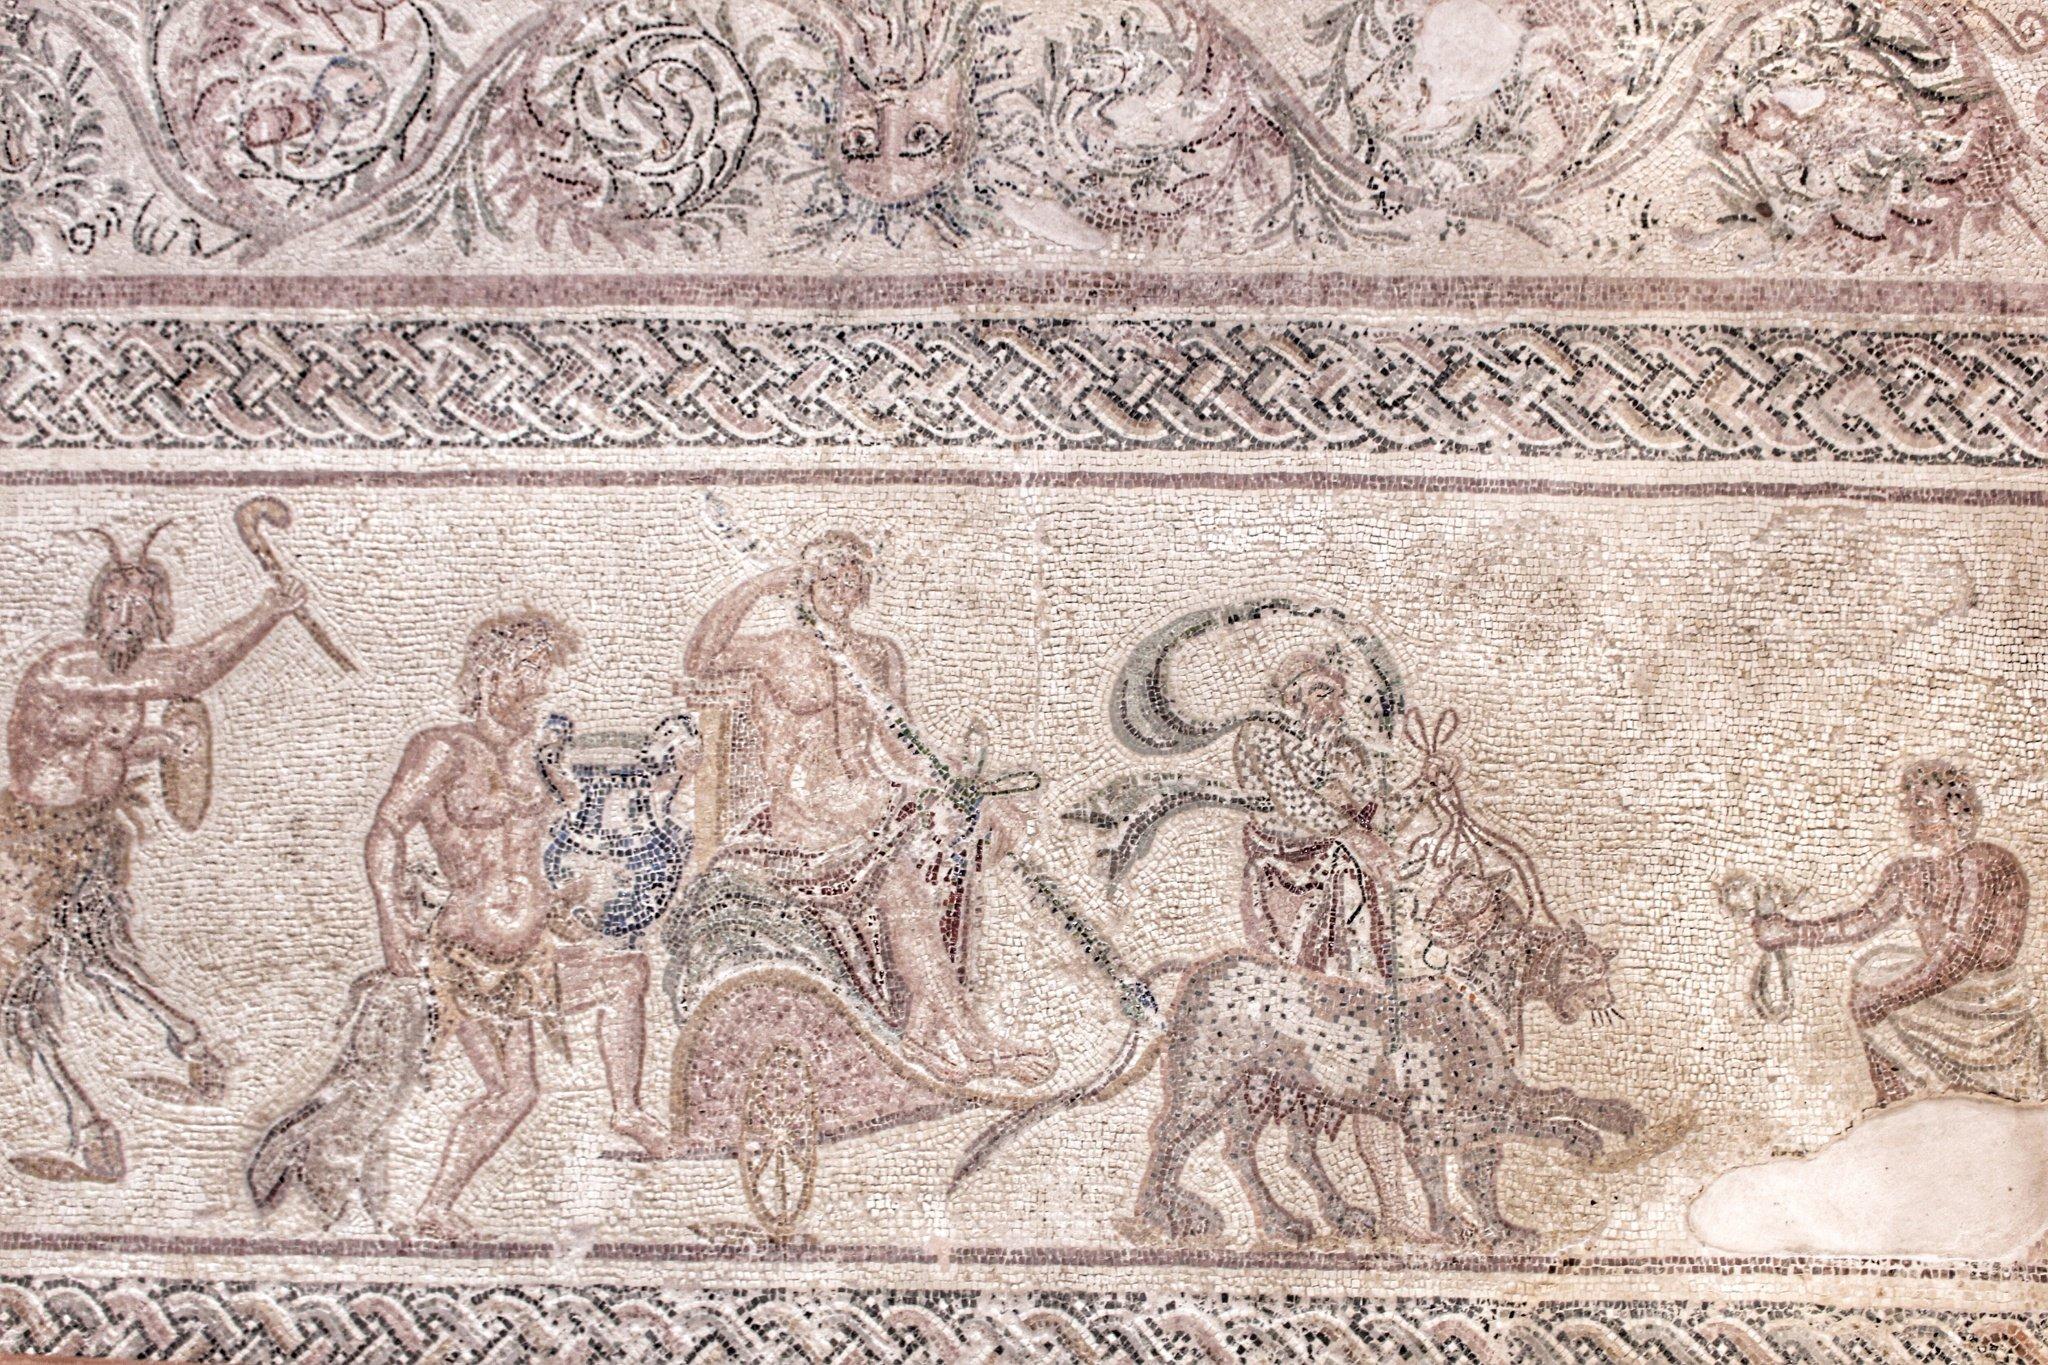 Roman mosaics in Cyprus: Kato Paphos Archaeological Park